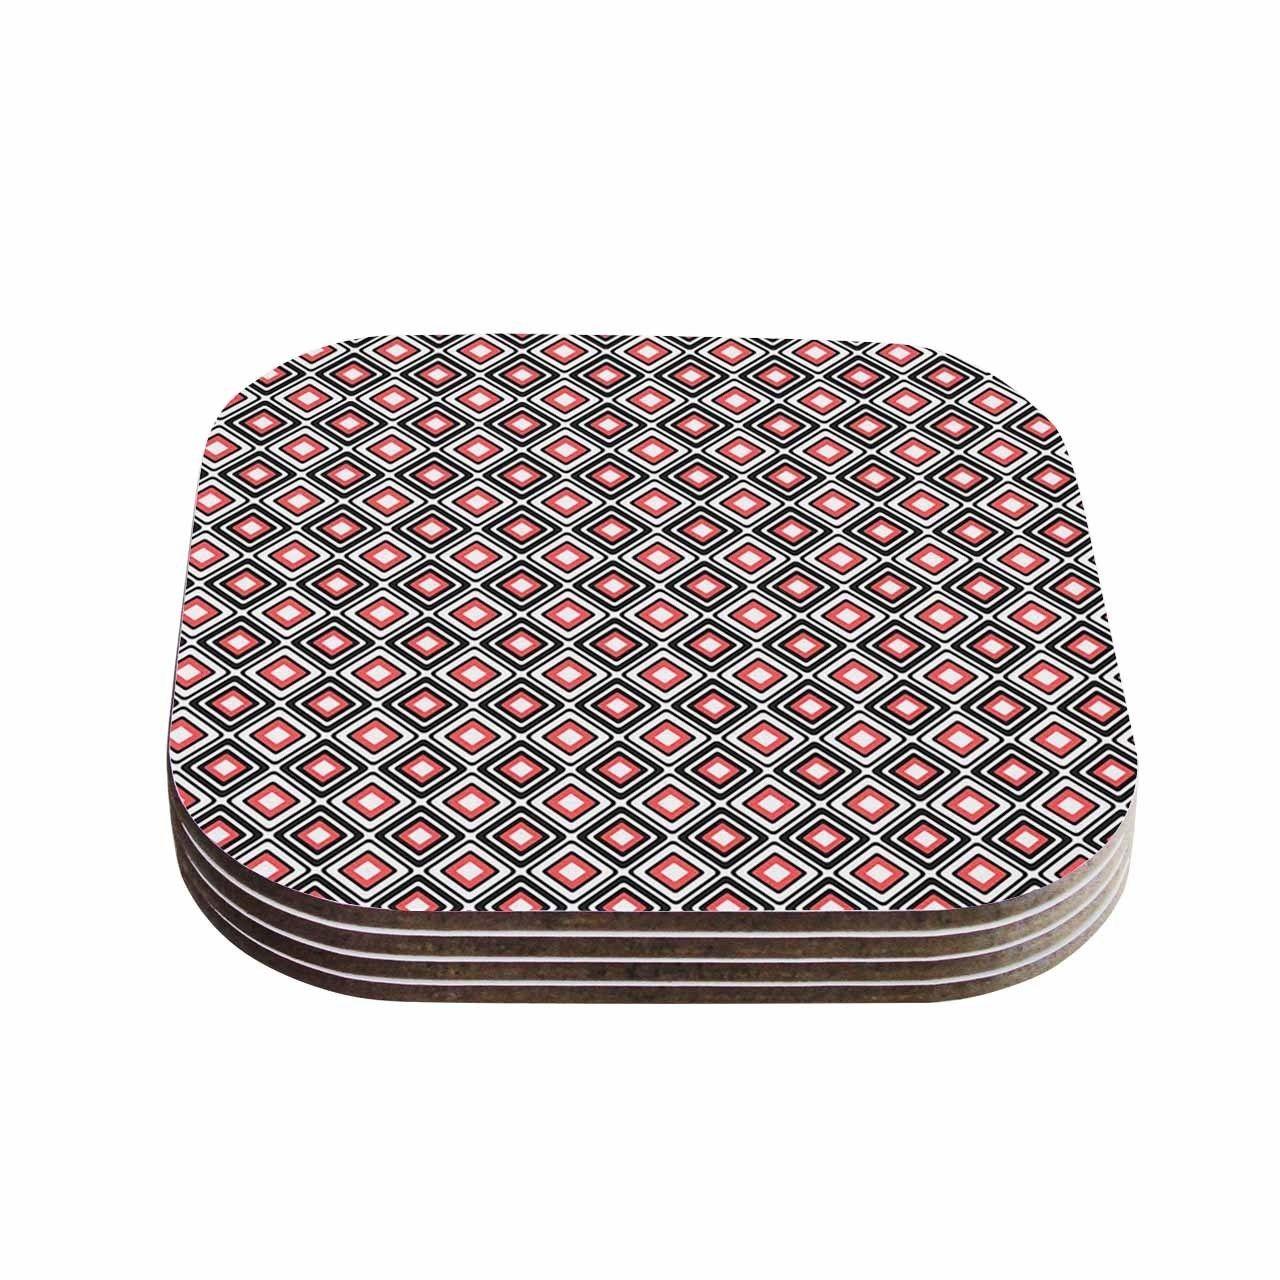 Kess InHouse Nandita Singh 'Bright Squares-Coral' Pattern Coasters